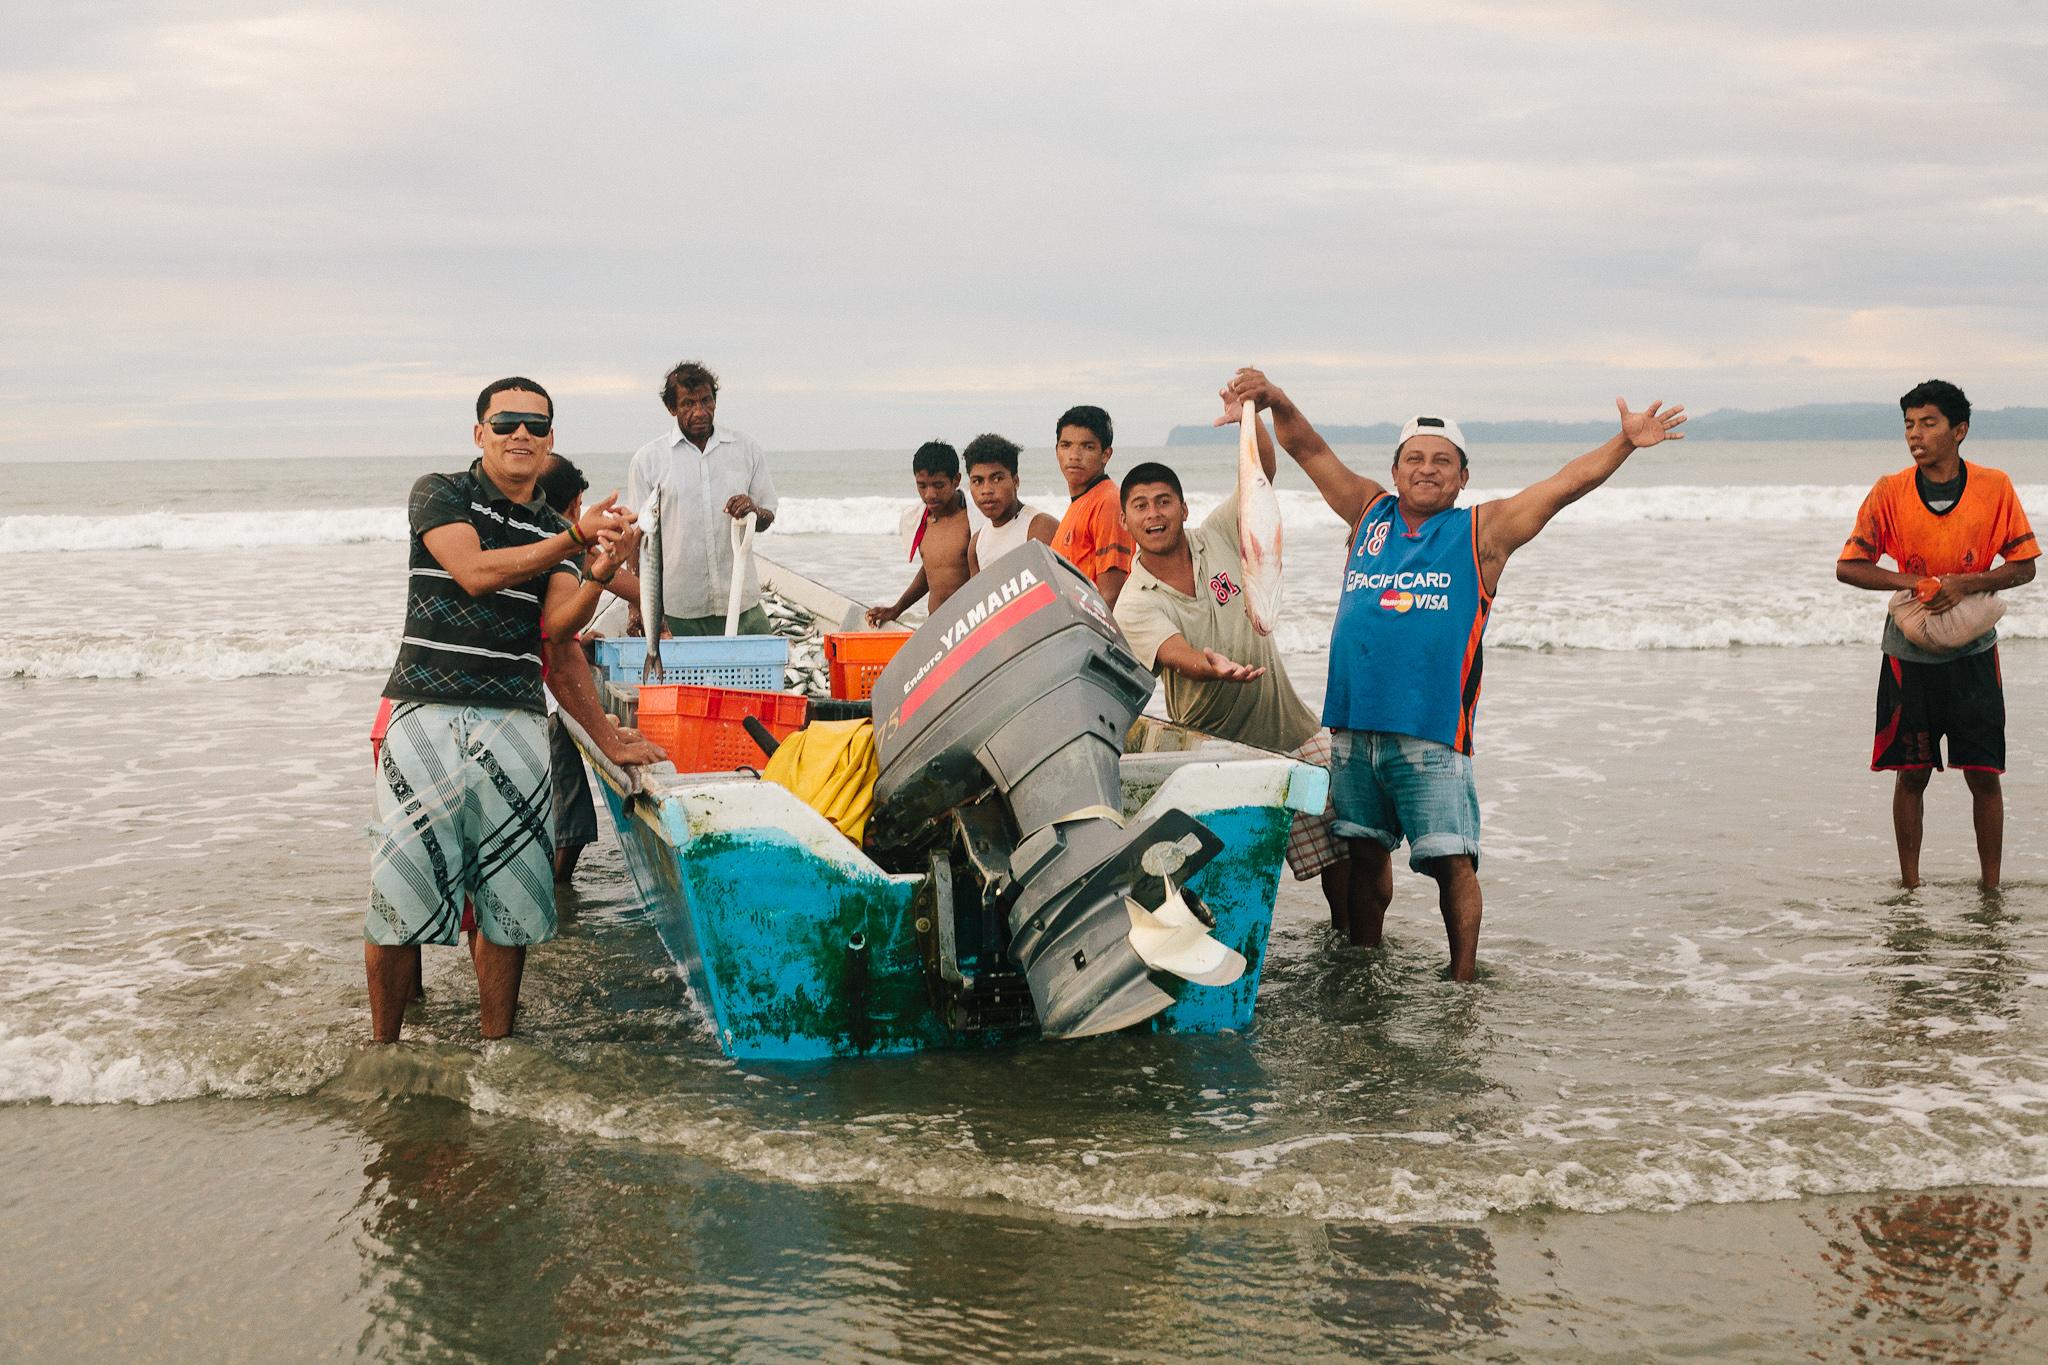 Ecuador2011_Mountains&Sea_Web_jenniferleahy-084.jpg